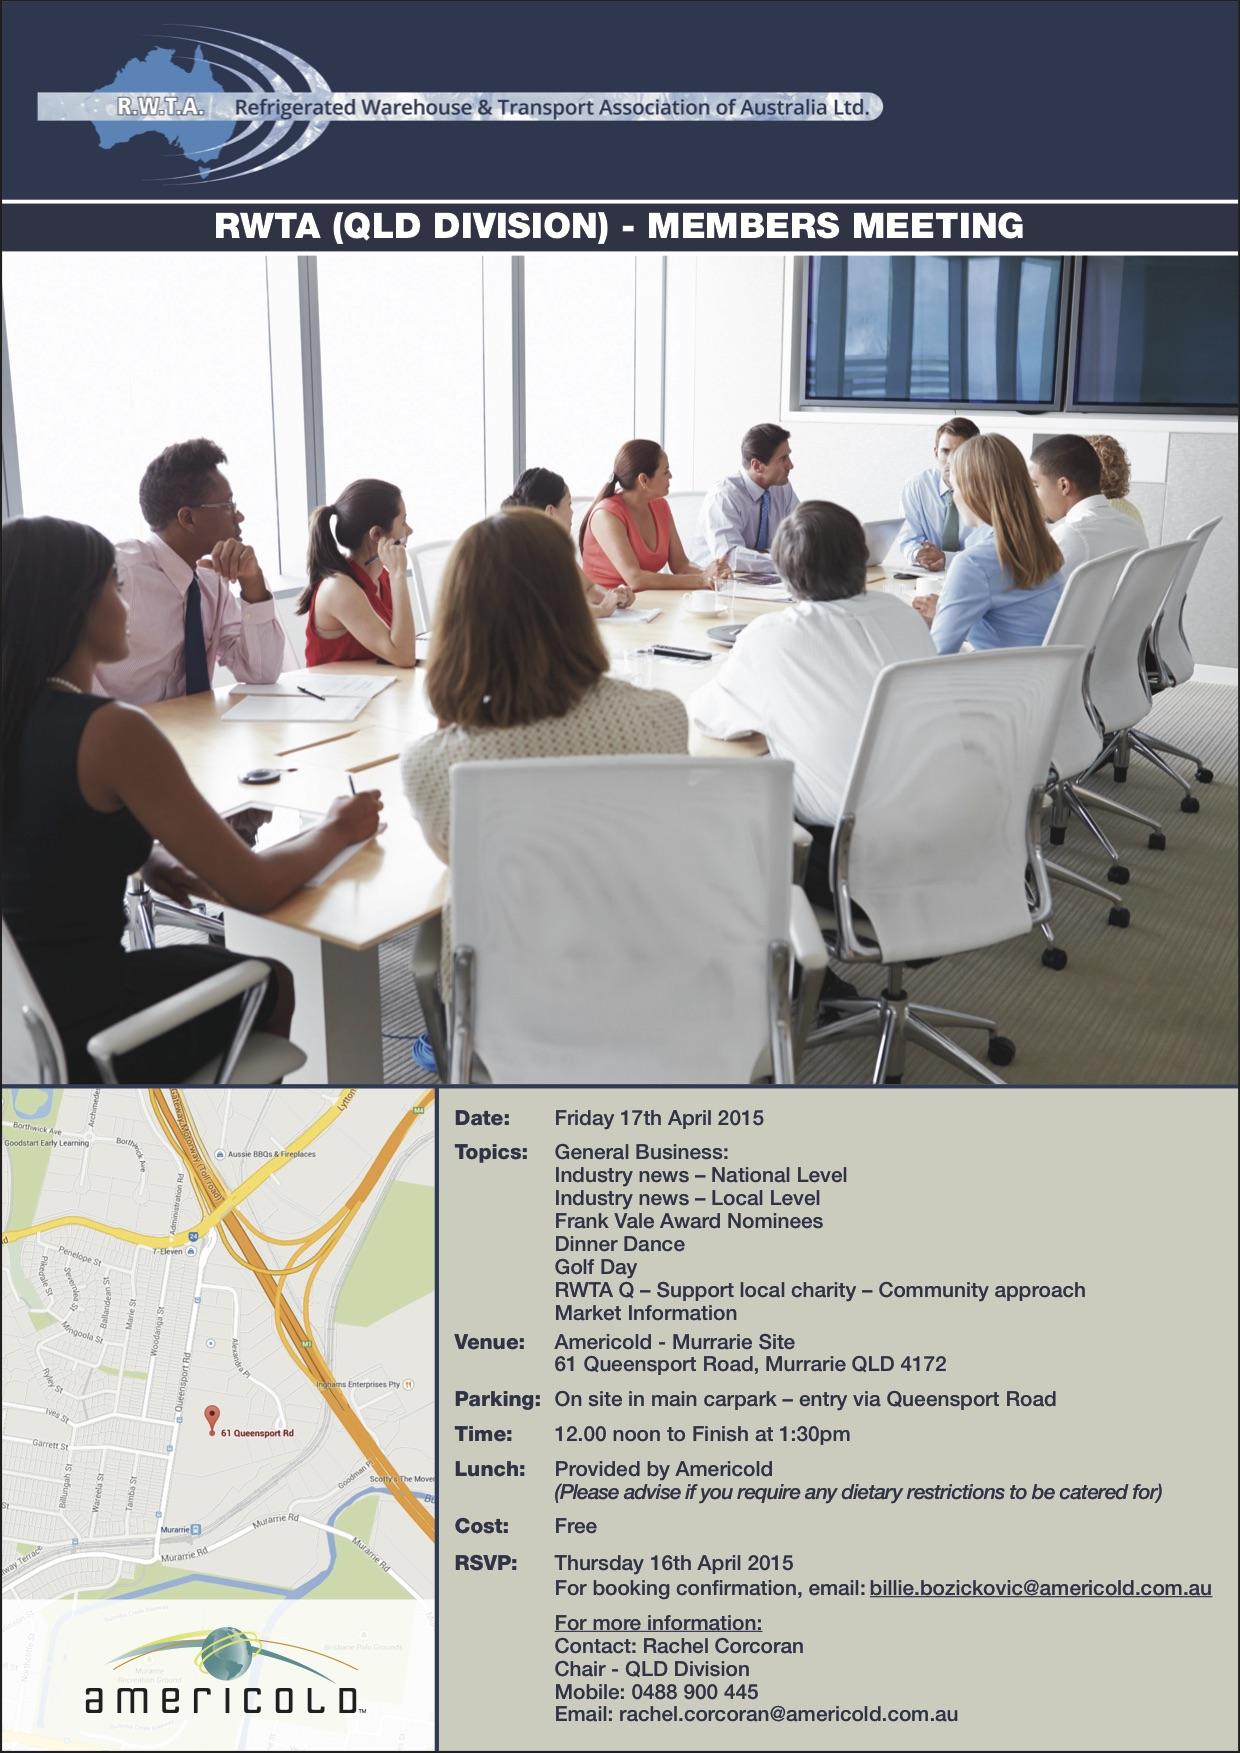 RWTA_QLD Division Members Meeting_ 17 Apr 15_Flyer.jpg